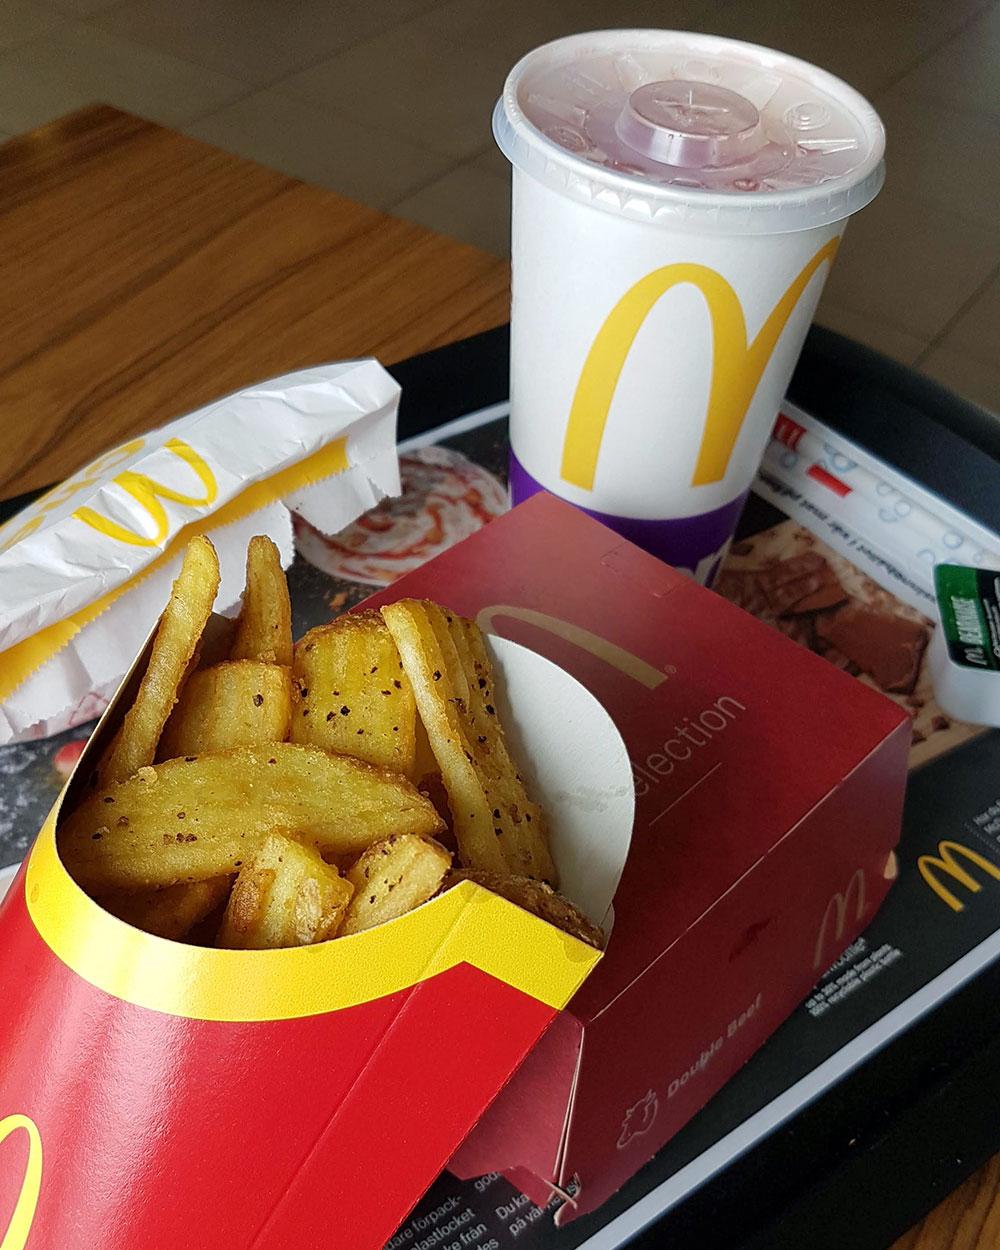 Helen J Holmberg provar McDonalds nya hamburgare McSelection